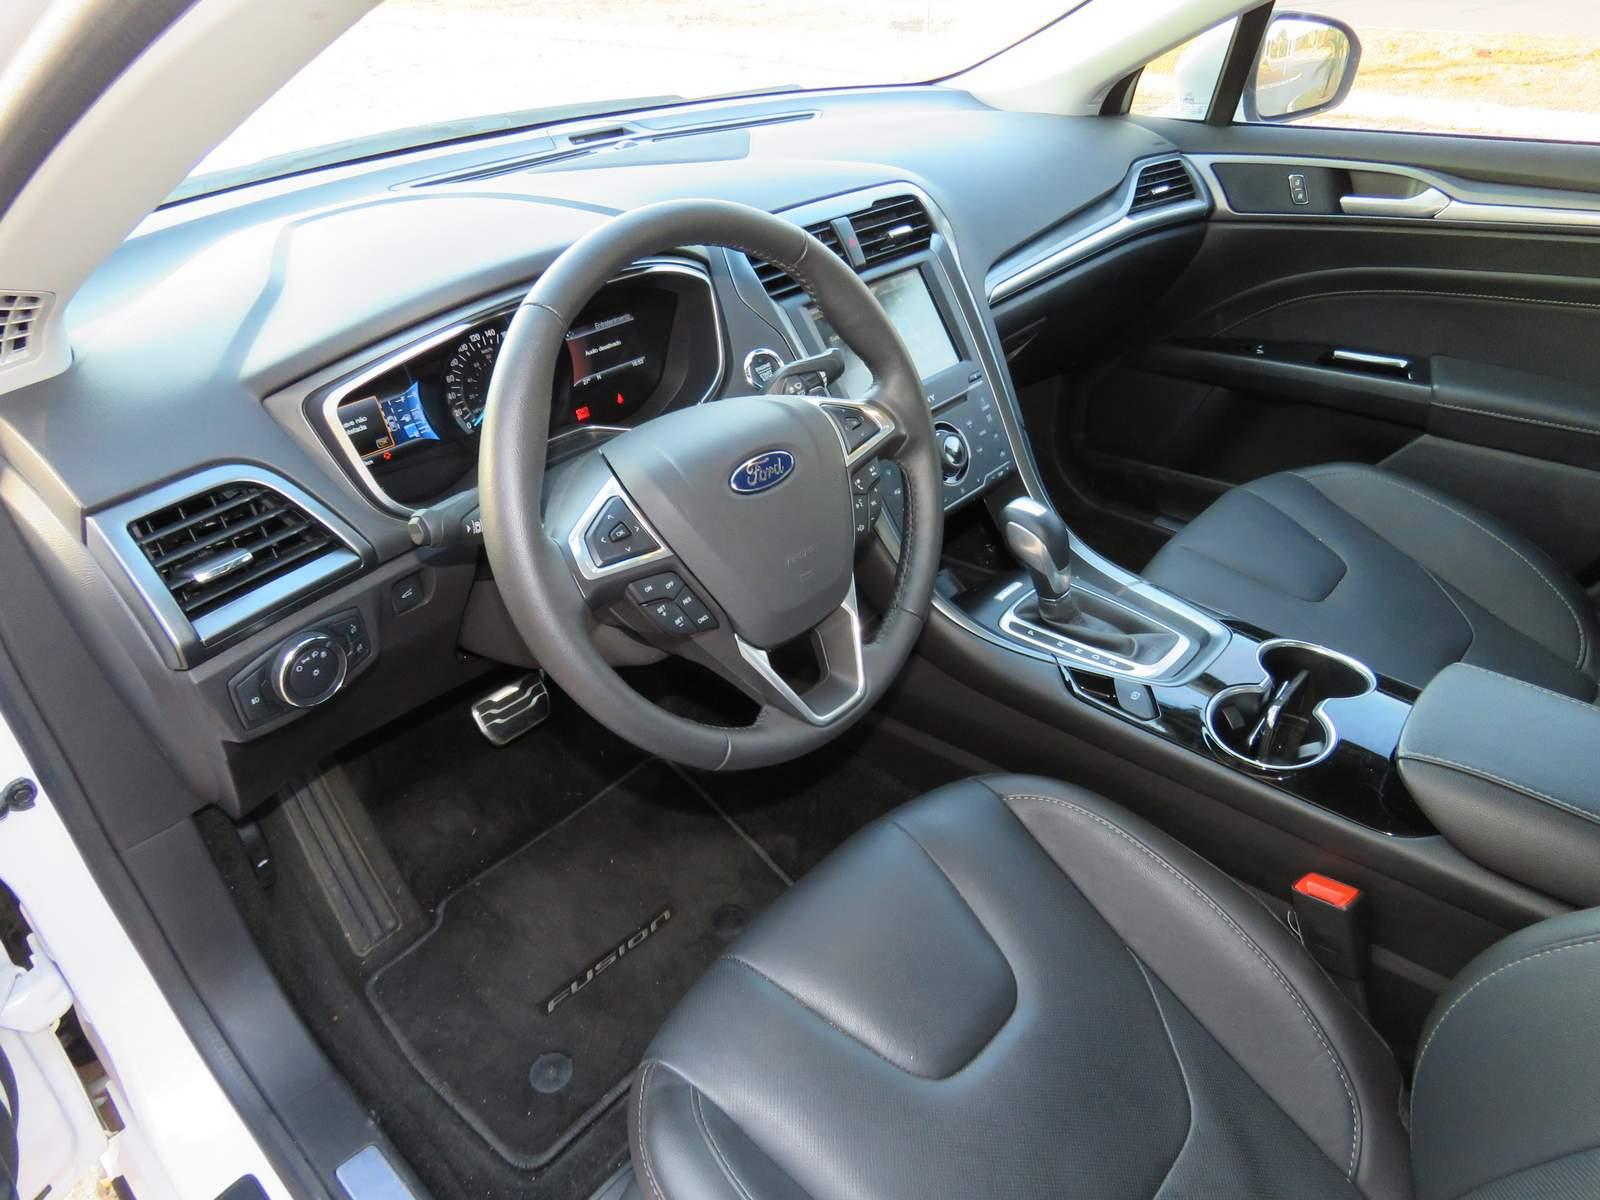 Ford fusion 2015 titanium ecoboost fwd avalia o cr tica car blog br for 2015 ford fusion titanium interior